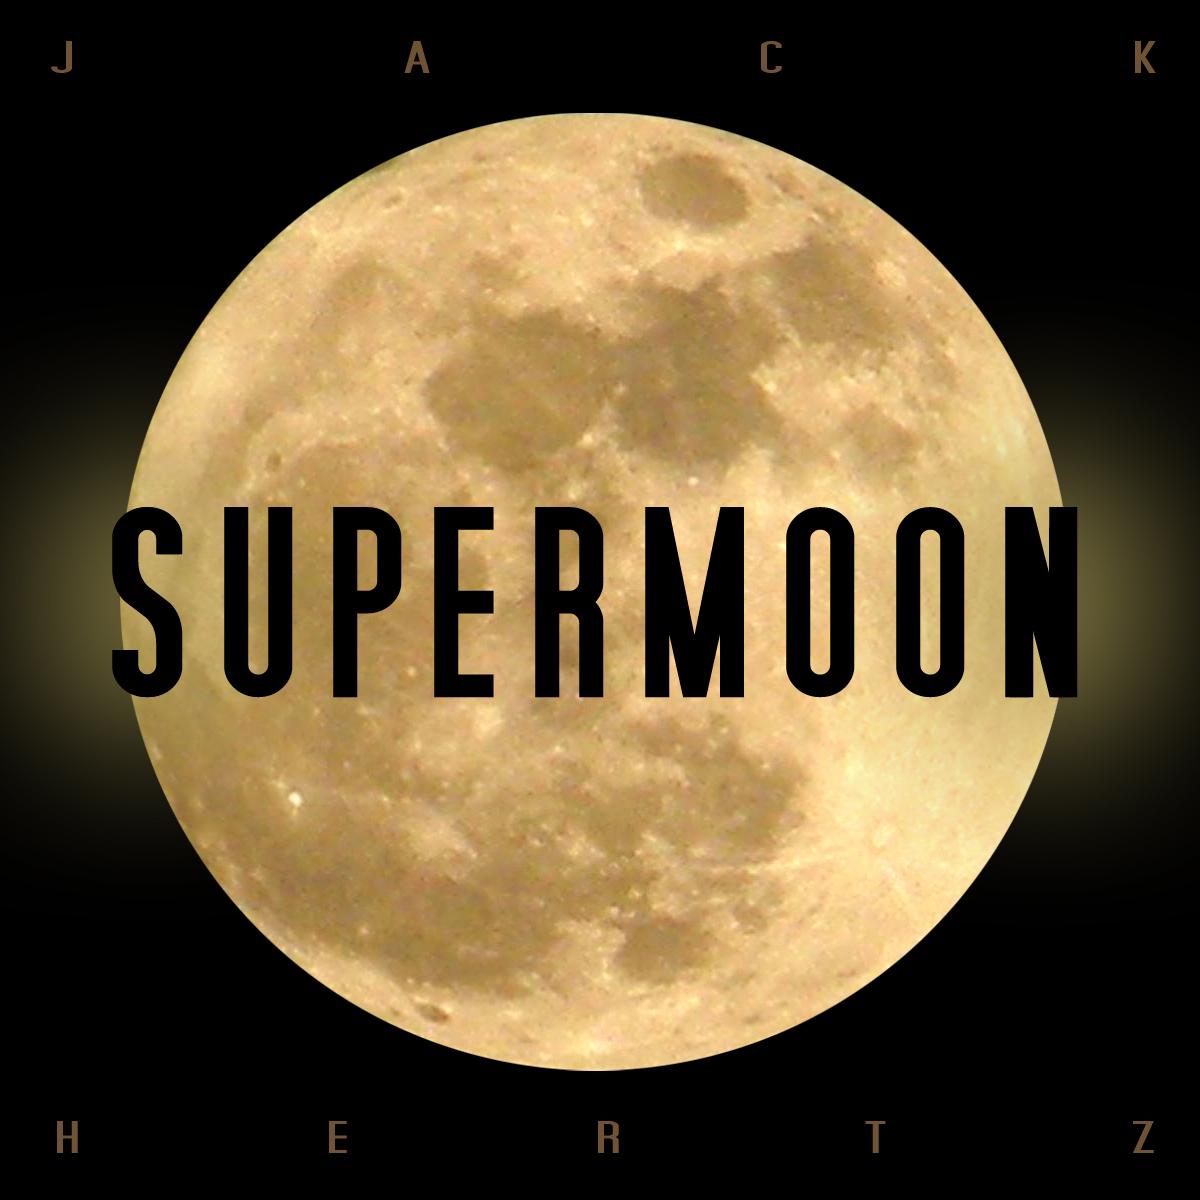 45E021-2013] Jack Hertz - Supermoon | 45 ECHOES SOUNDS